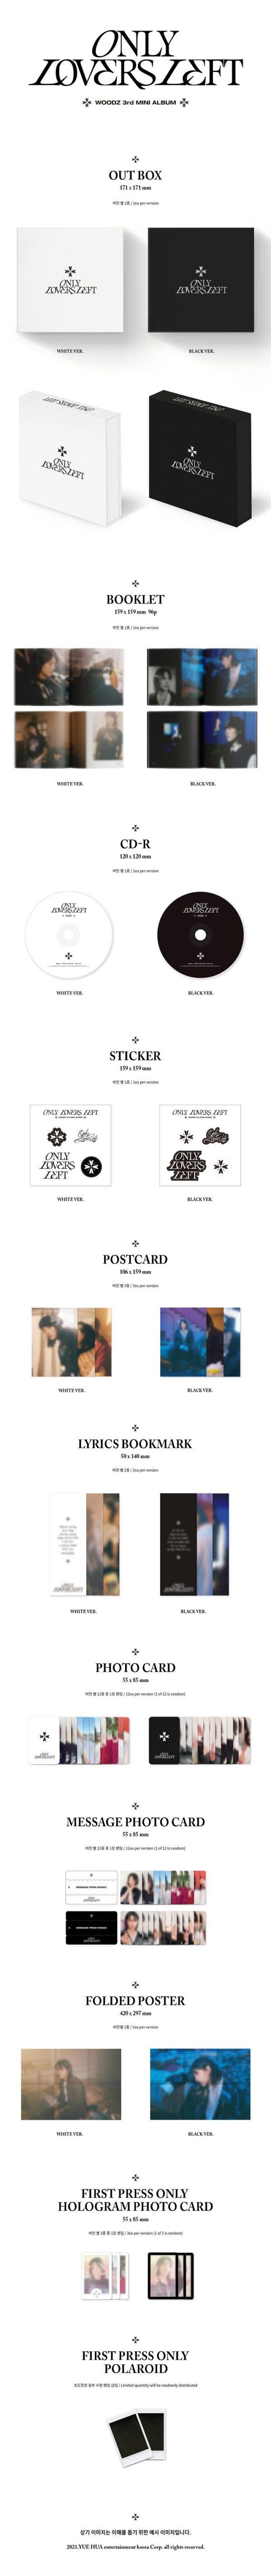 3rd Mini Album de WOODZ ONLY LOVERS LEFT Random Ver.